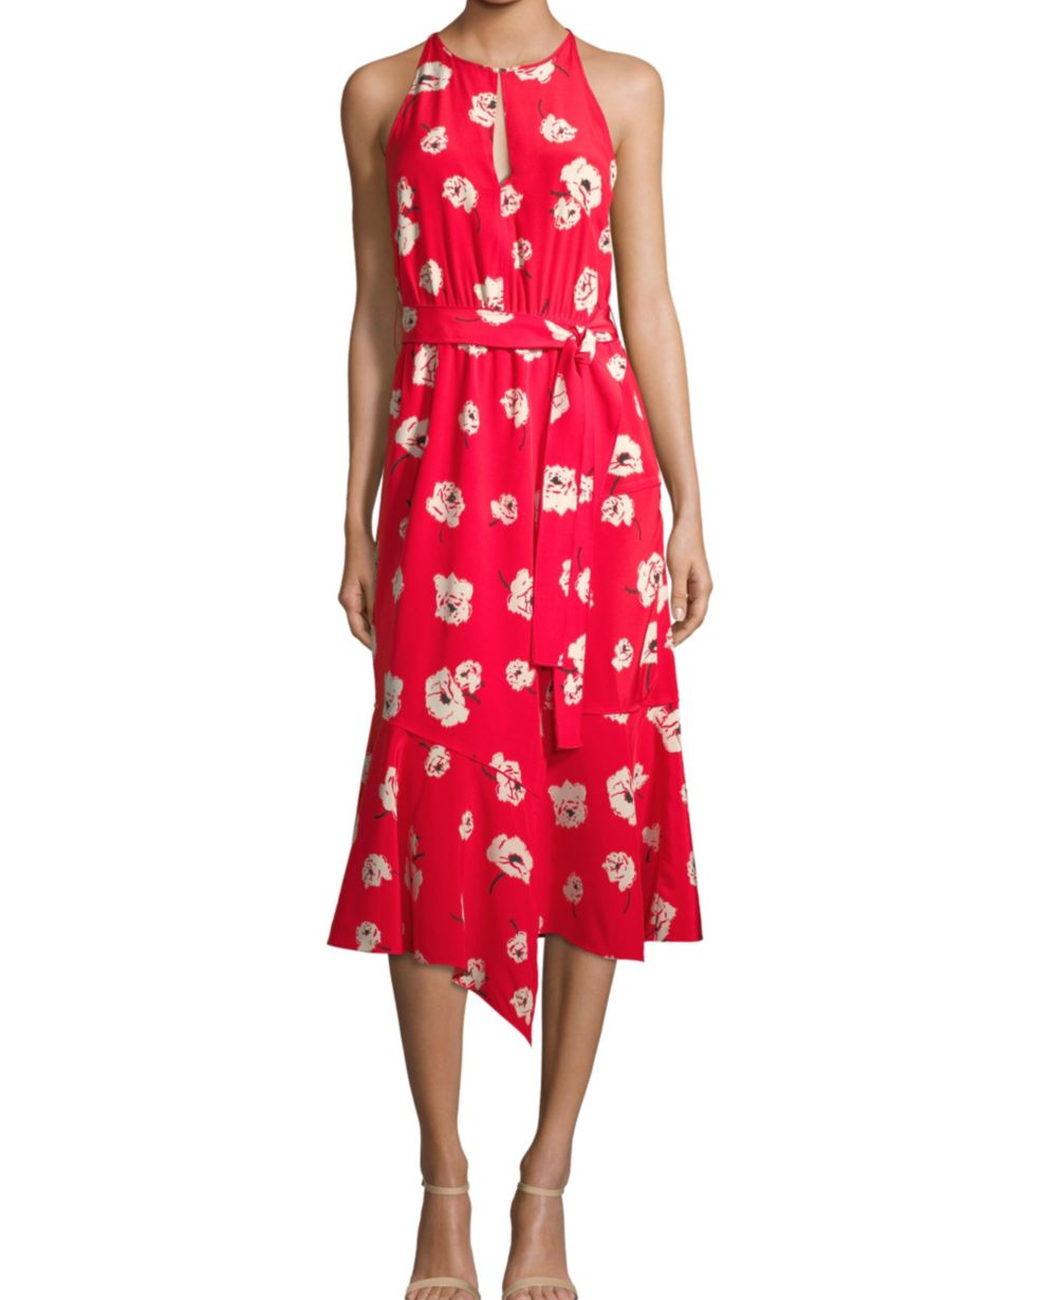 Derek Lam 10 Crosby Asymmetric Dress